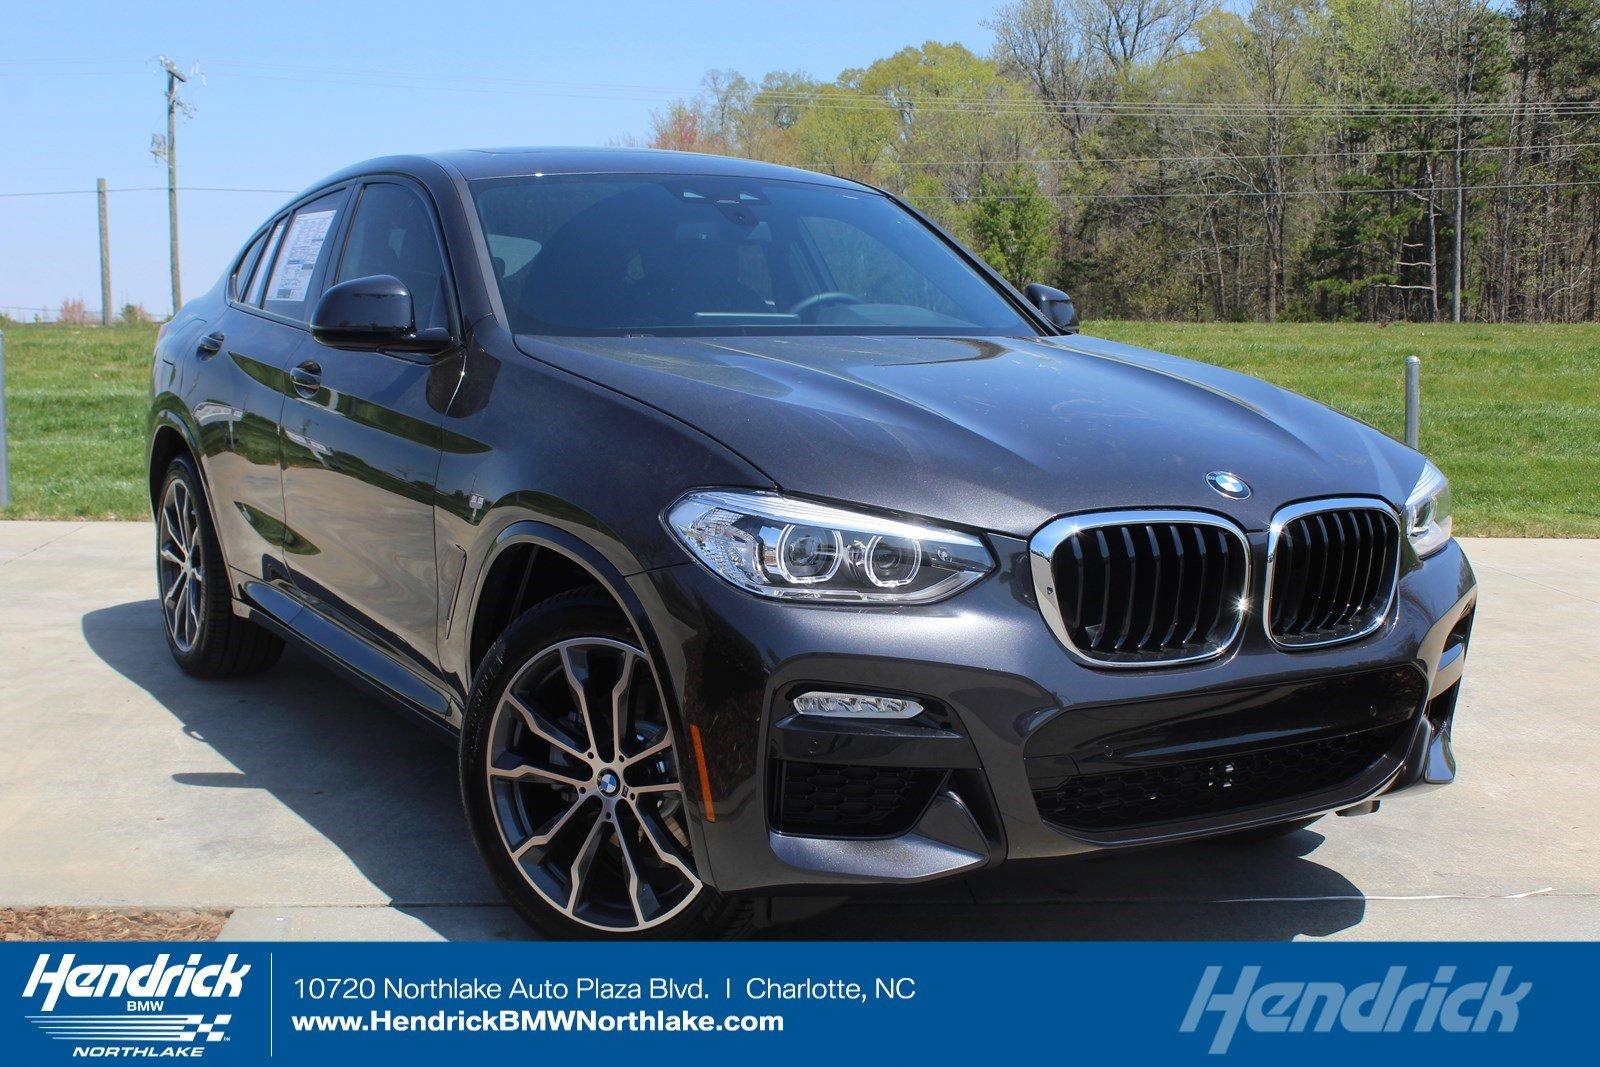 2019 BMW X4 For Sale in Charlotte NC | Hendrick BMW Northlake